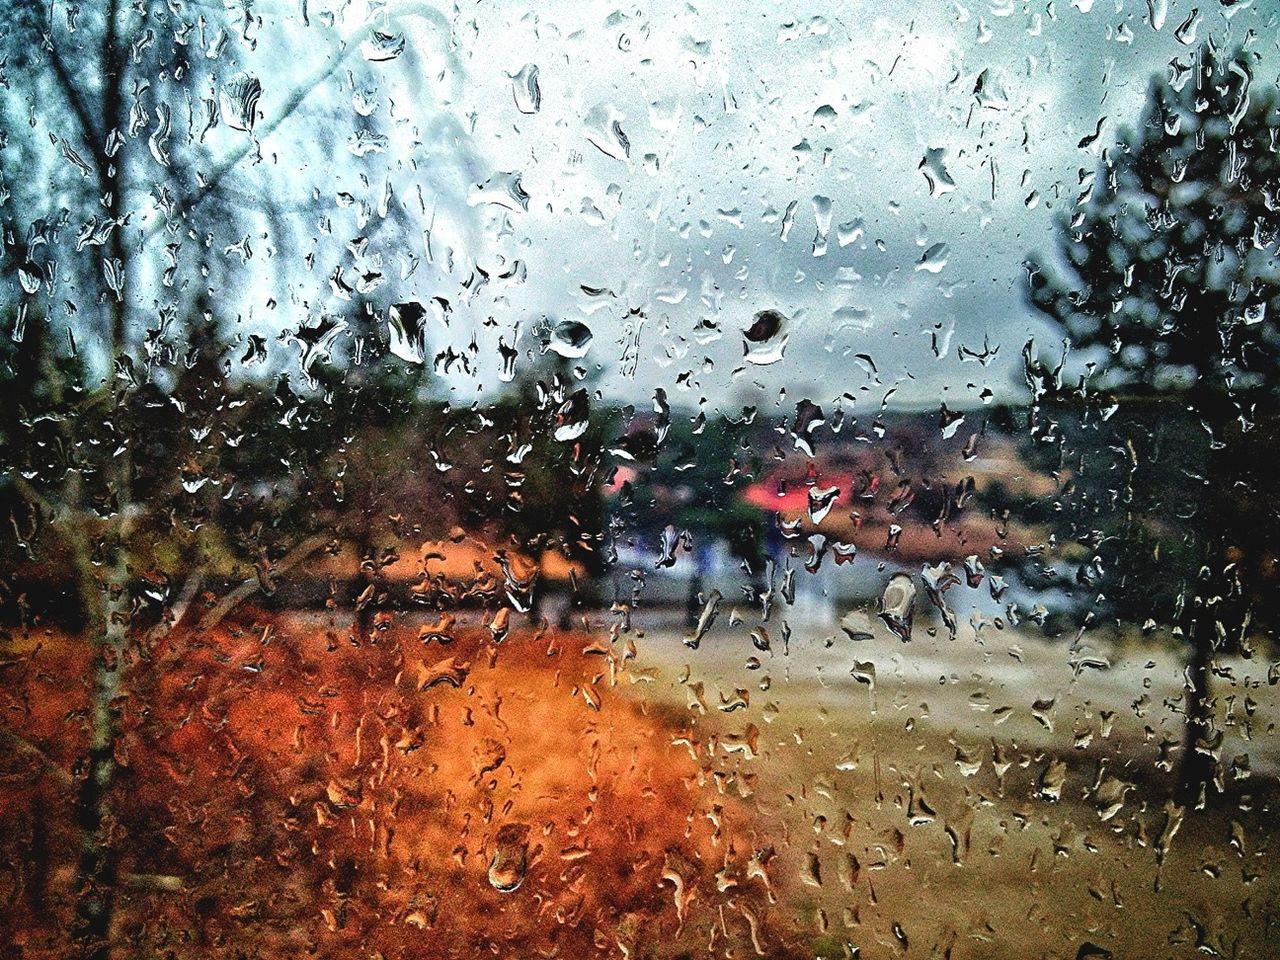 VIEW OF RAIN DROPS ON WINDOW